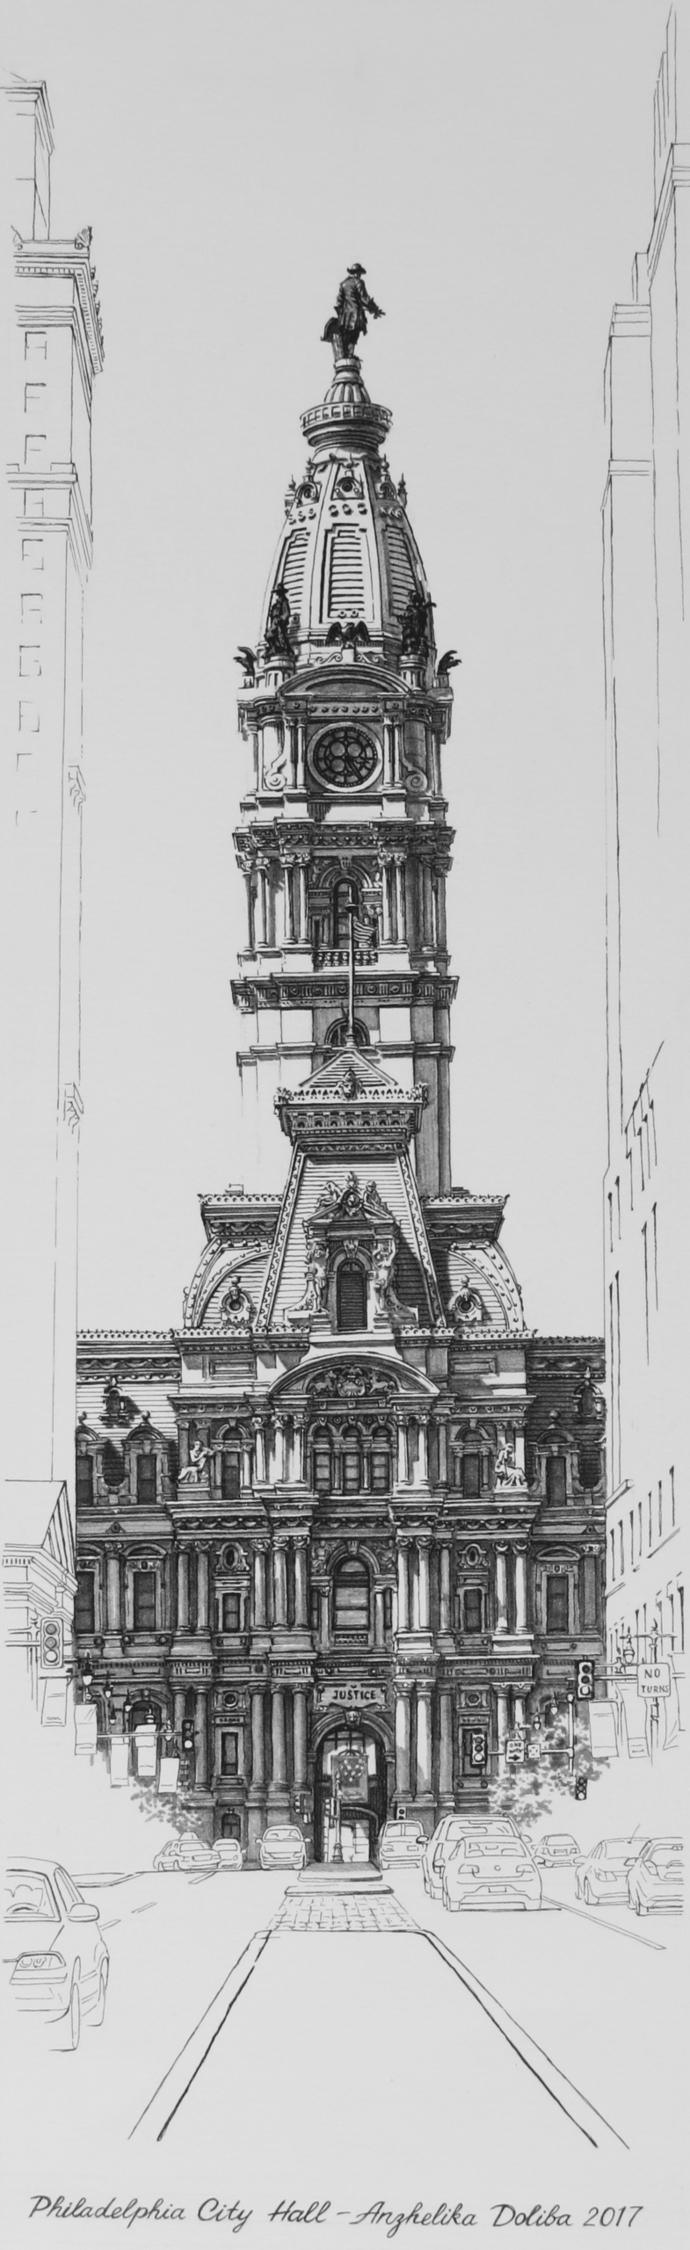 Philadelphia City Hall. Drawing - anzhelikadoliba | ello